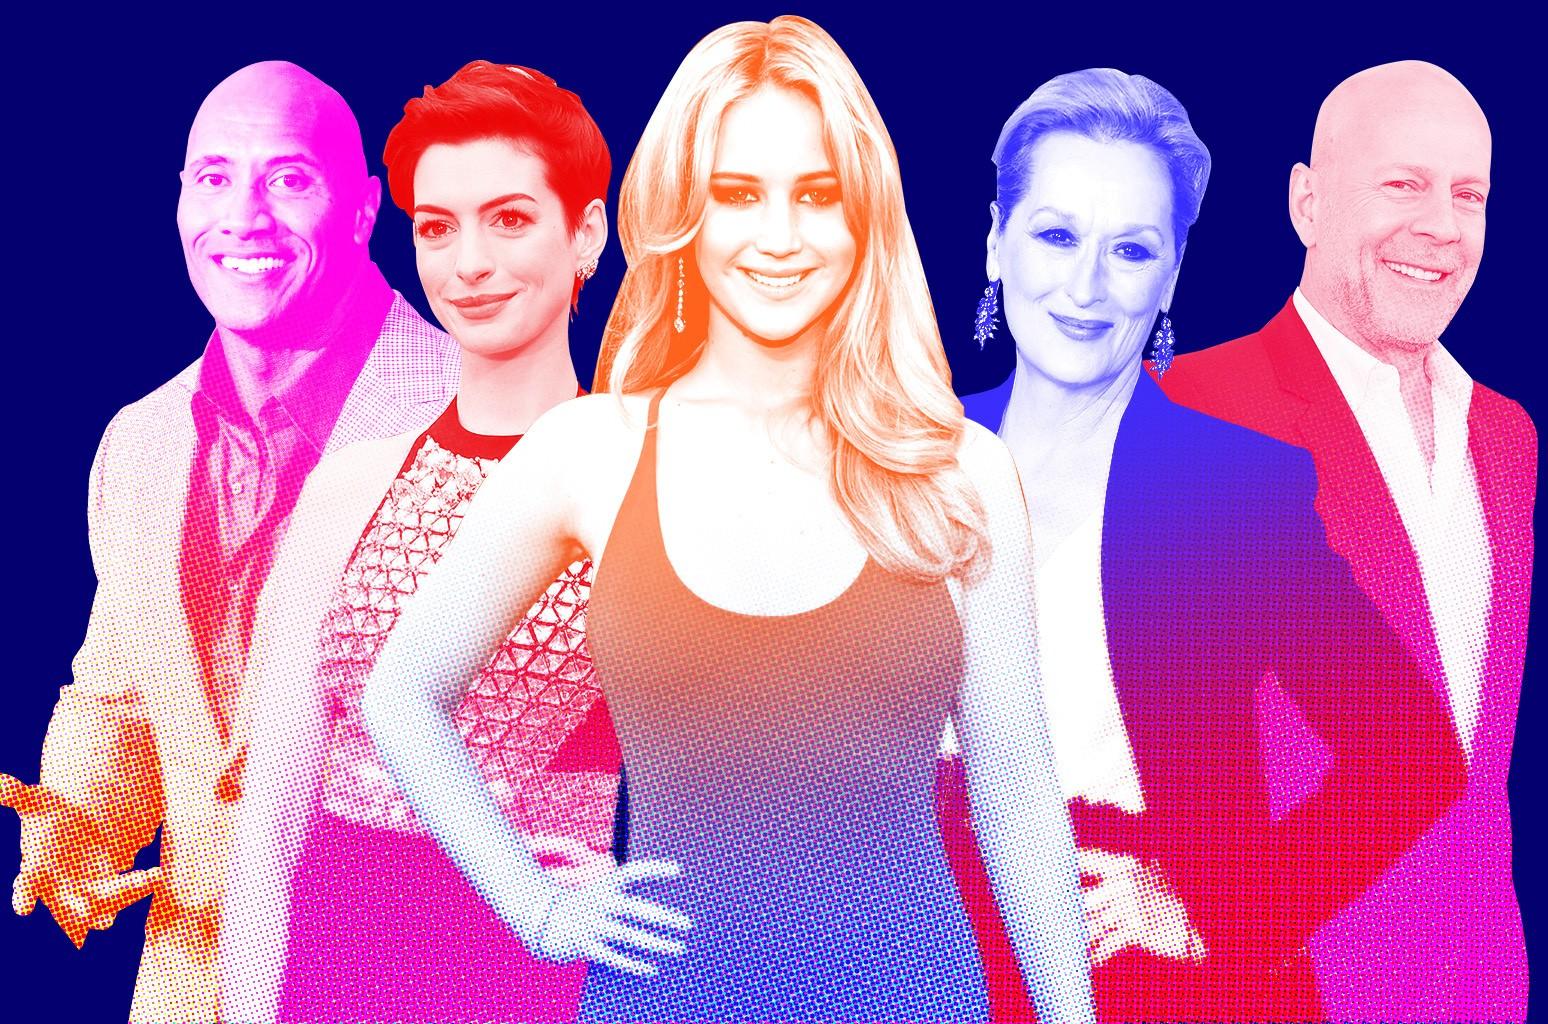 Dwayne Johnson, Anne Hathaway, Jennifer Lawrence, Meryl Streep & Bruce Willis